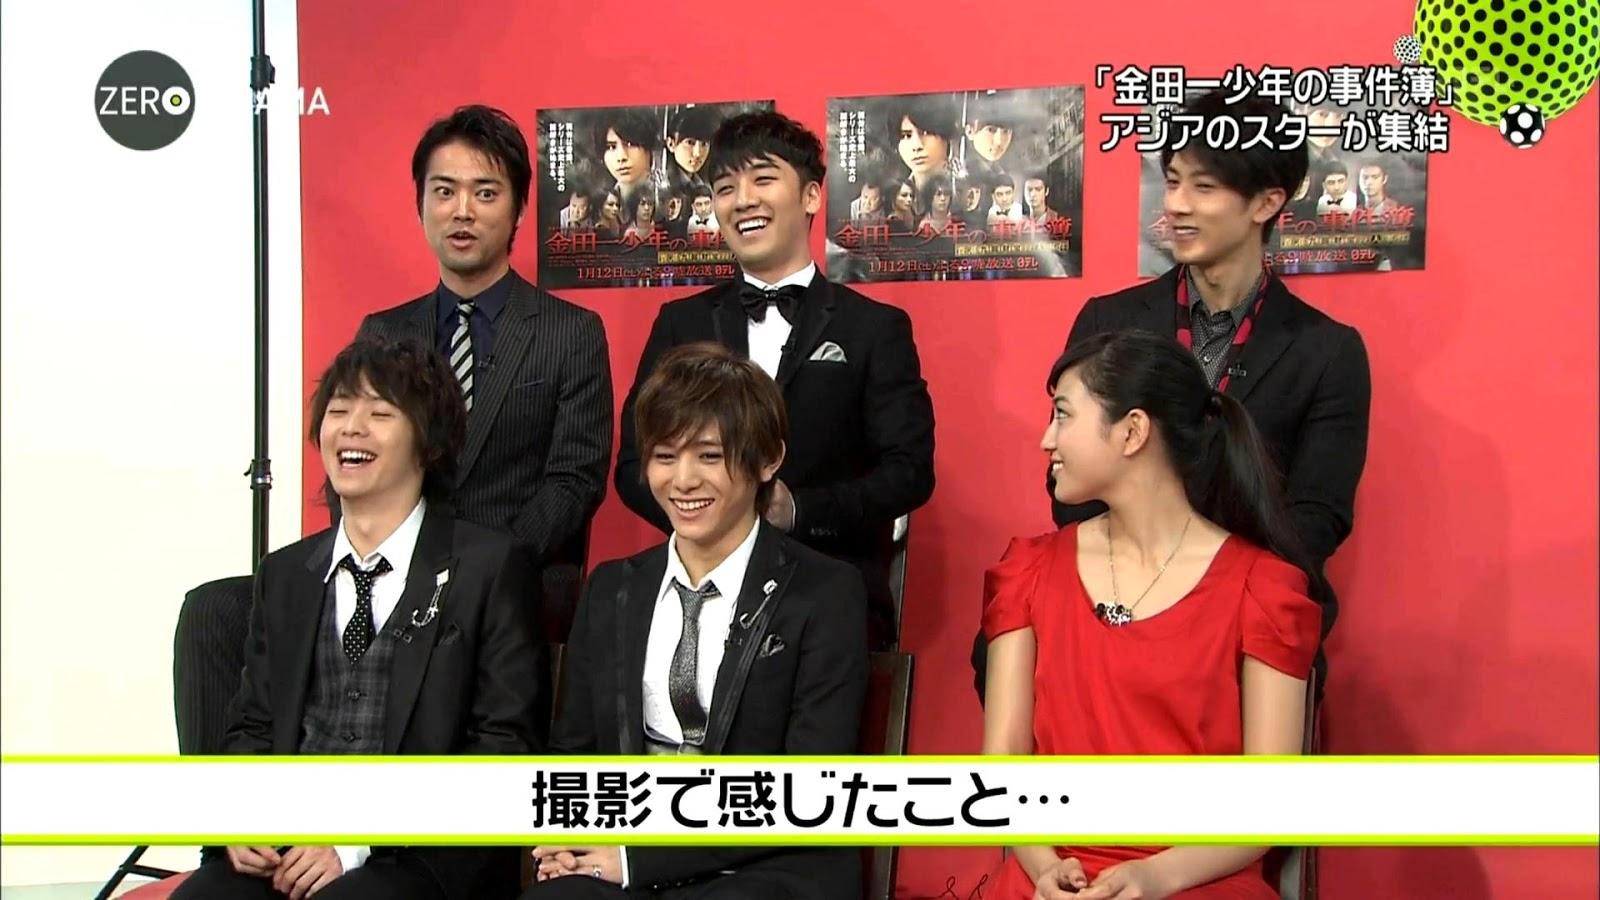 H!S!JUMP: Kindaichi Shounen no Jikenbo NEWS ZERO, ZIP ... Yamada Ryosuke And Seungri